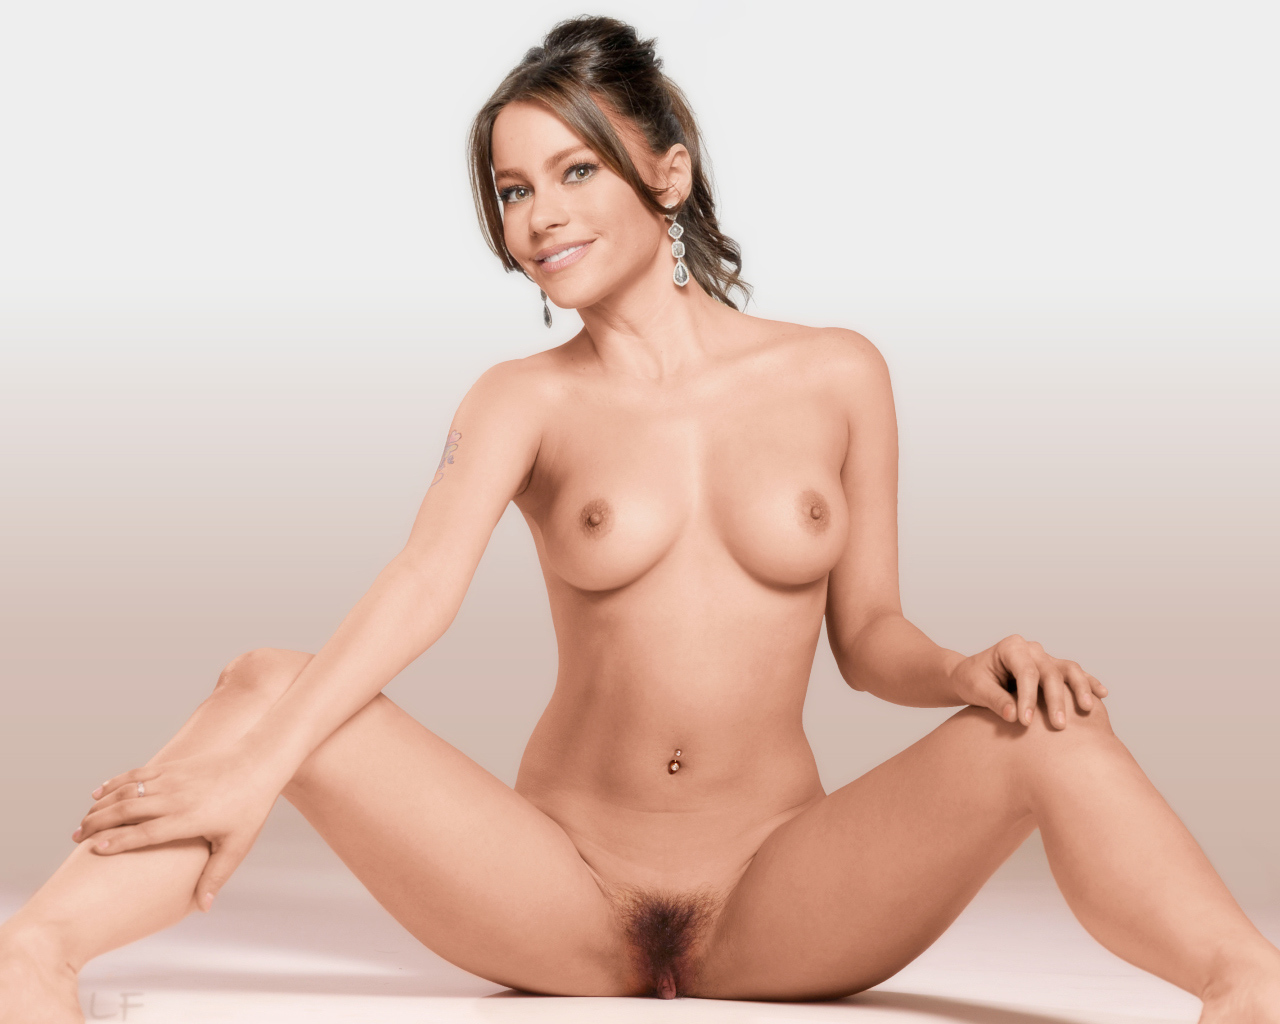 Sofia vergara tits naked xnxx — pic 7